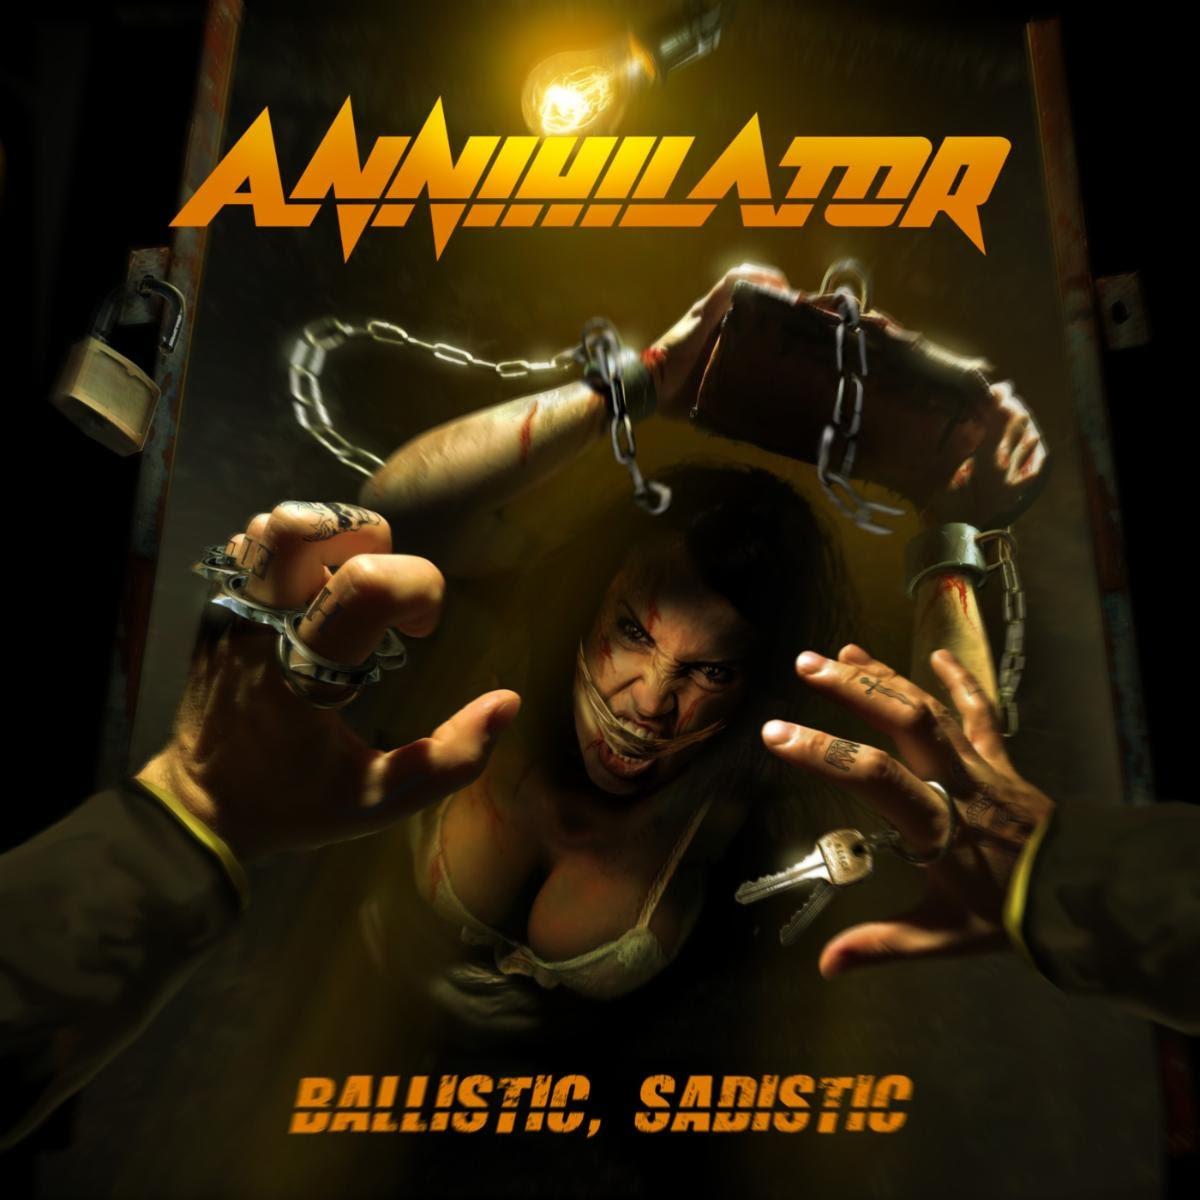 Annihilator To Release New Album 'Ballistic, Sadistic,' January 24th, 2020; New Track Streaming